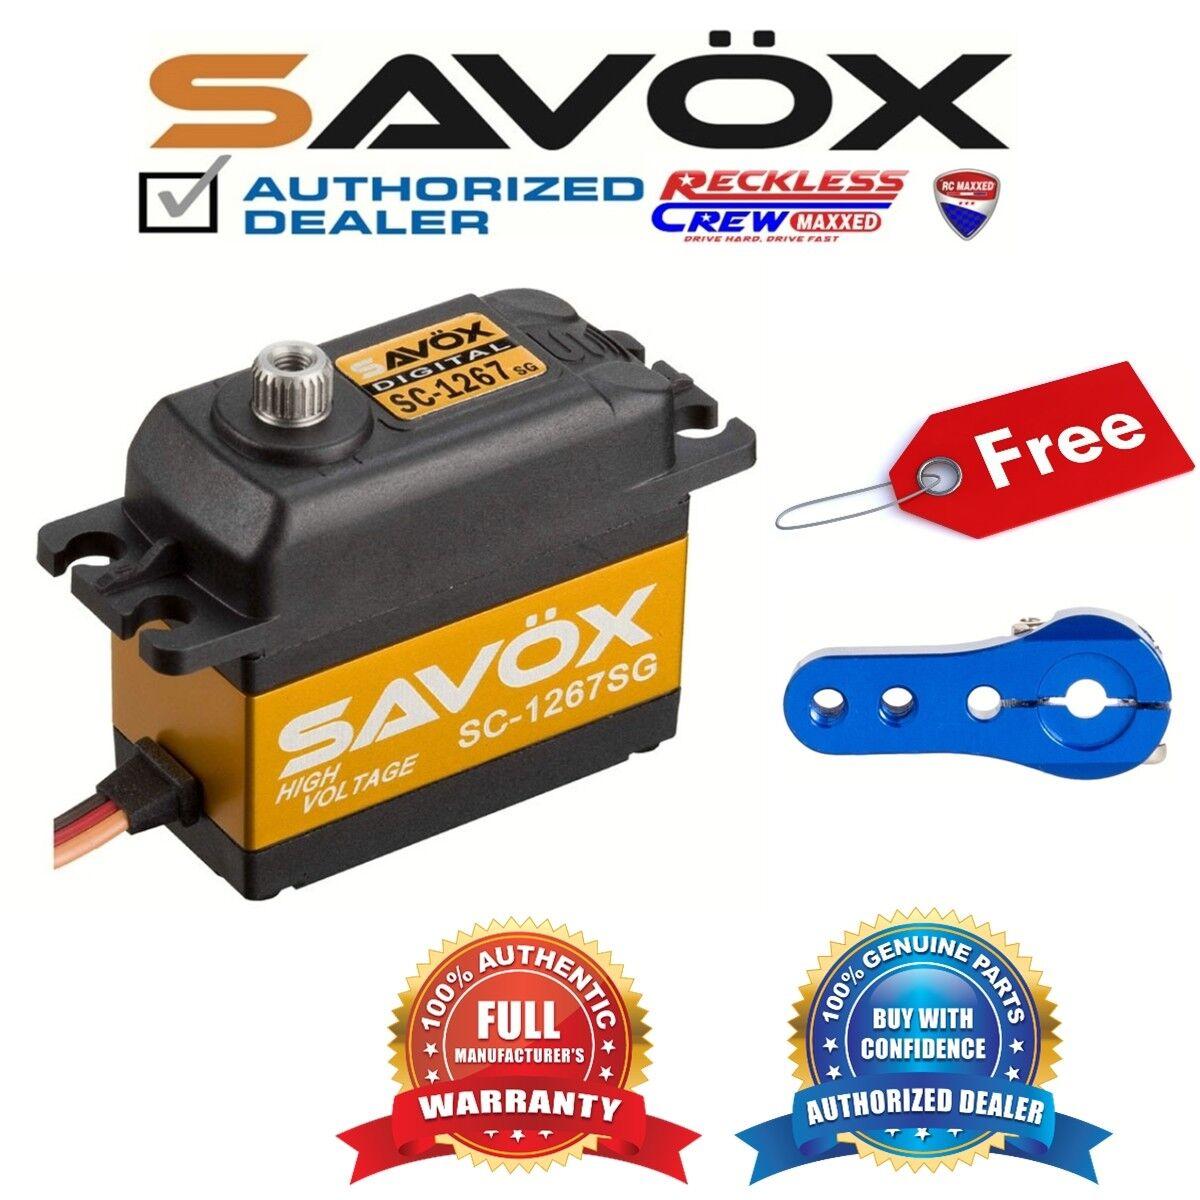 Savox SC-1267SG alto esfuerzo de torsión Digital Servo + Gratis Aluminio Servo Horn Azul